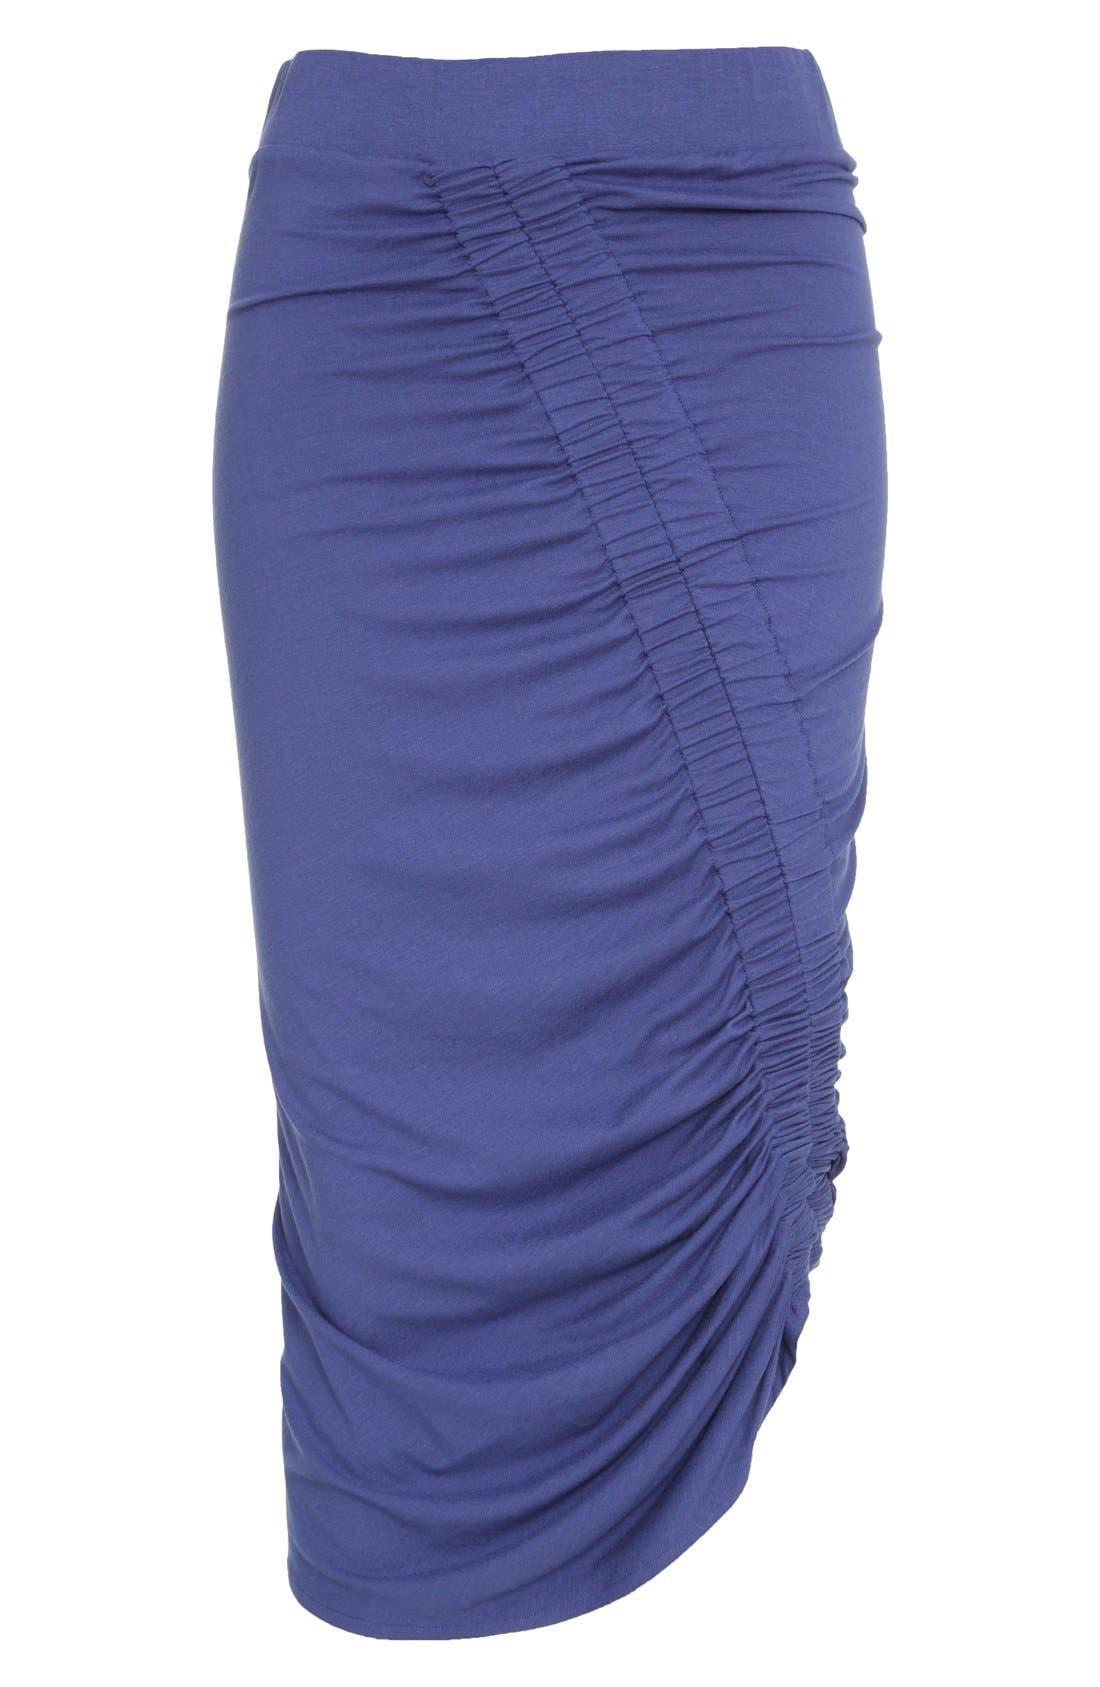 Alternate Image 4  - Zero + Maria Cornejo 'Kia' Ruched Sim Jersey Skirt